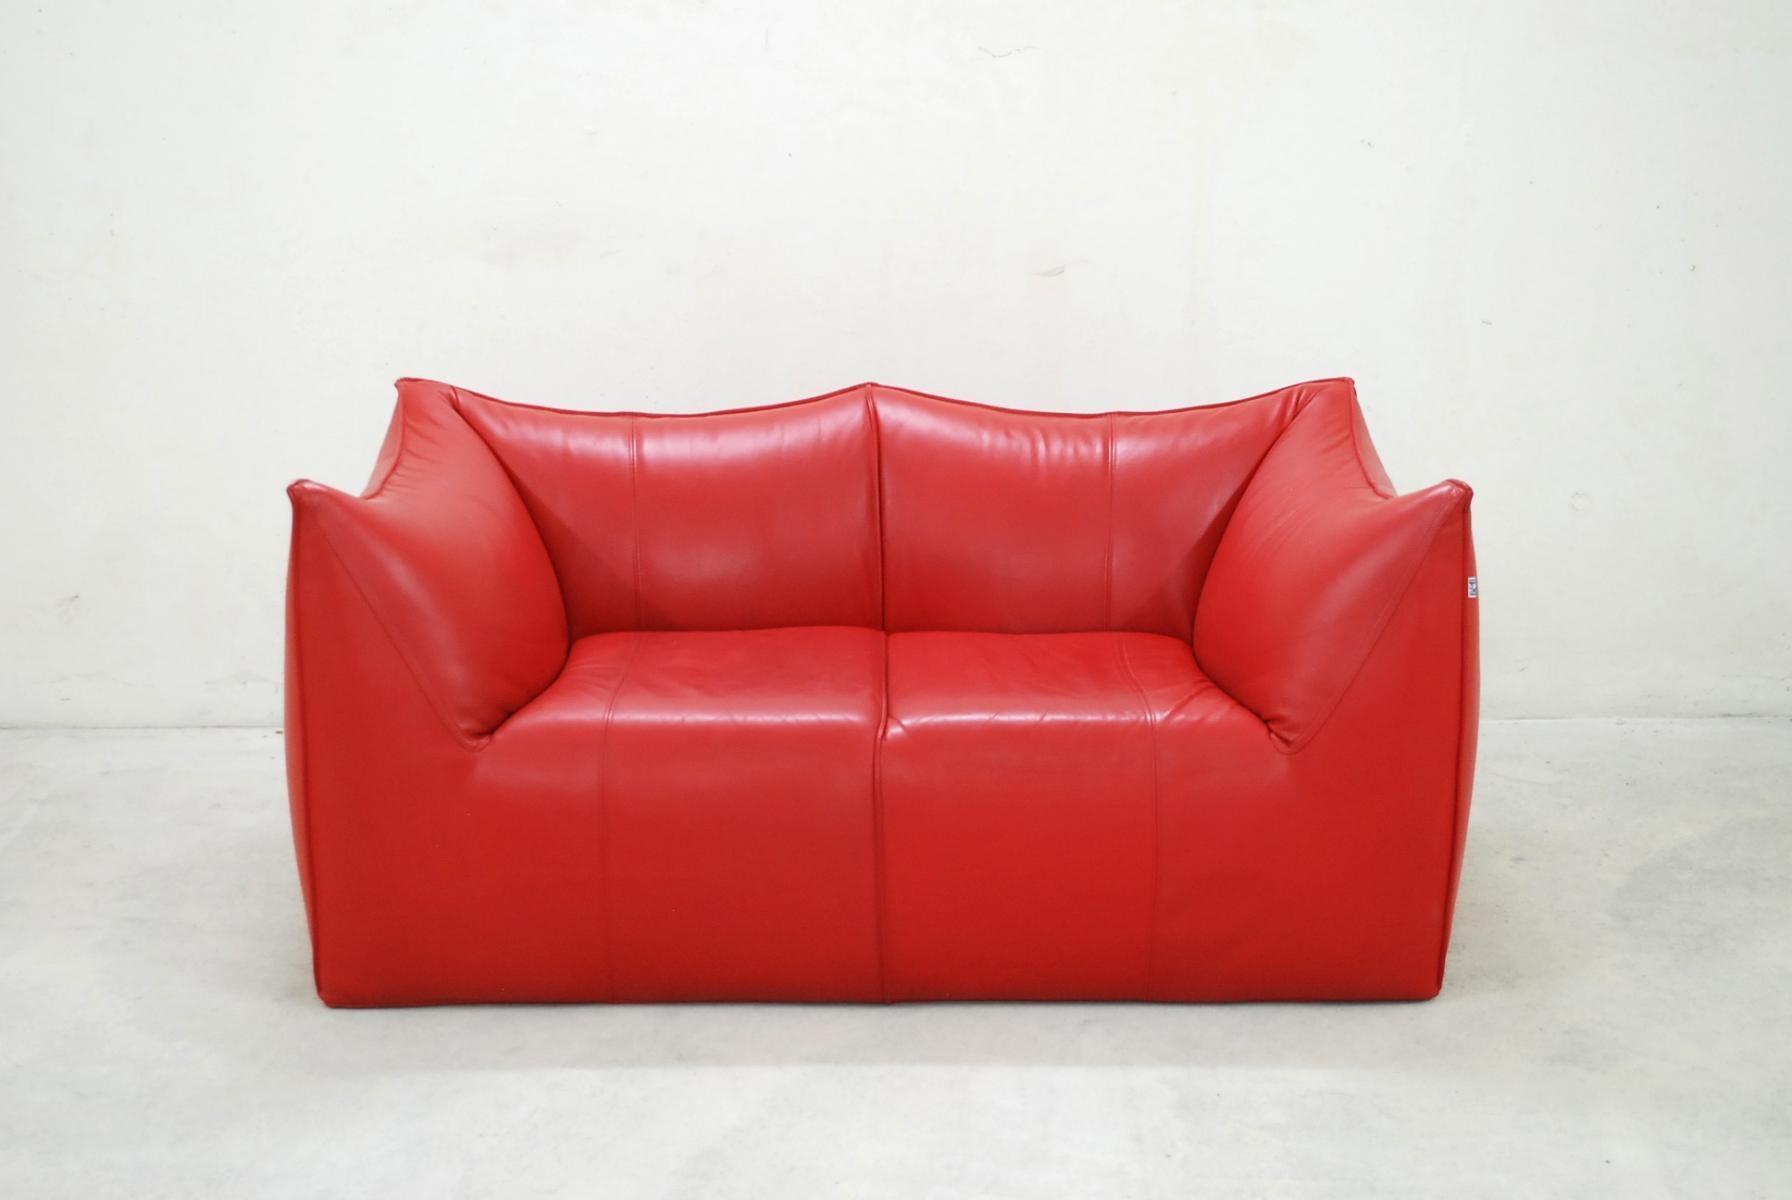 Italian Le Bambole Leather Sofamario Bellini For B&b Italia With Regard To Bellini Couches (Image 9 of 20)